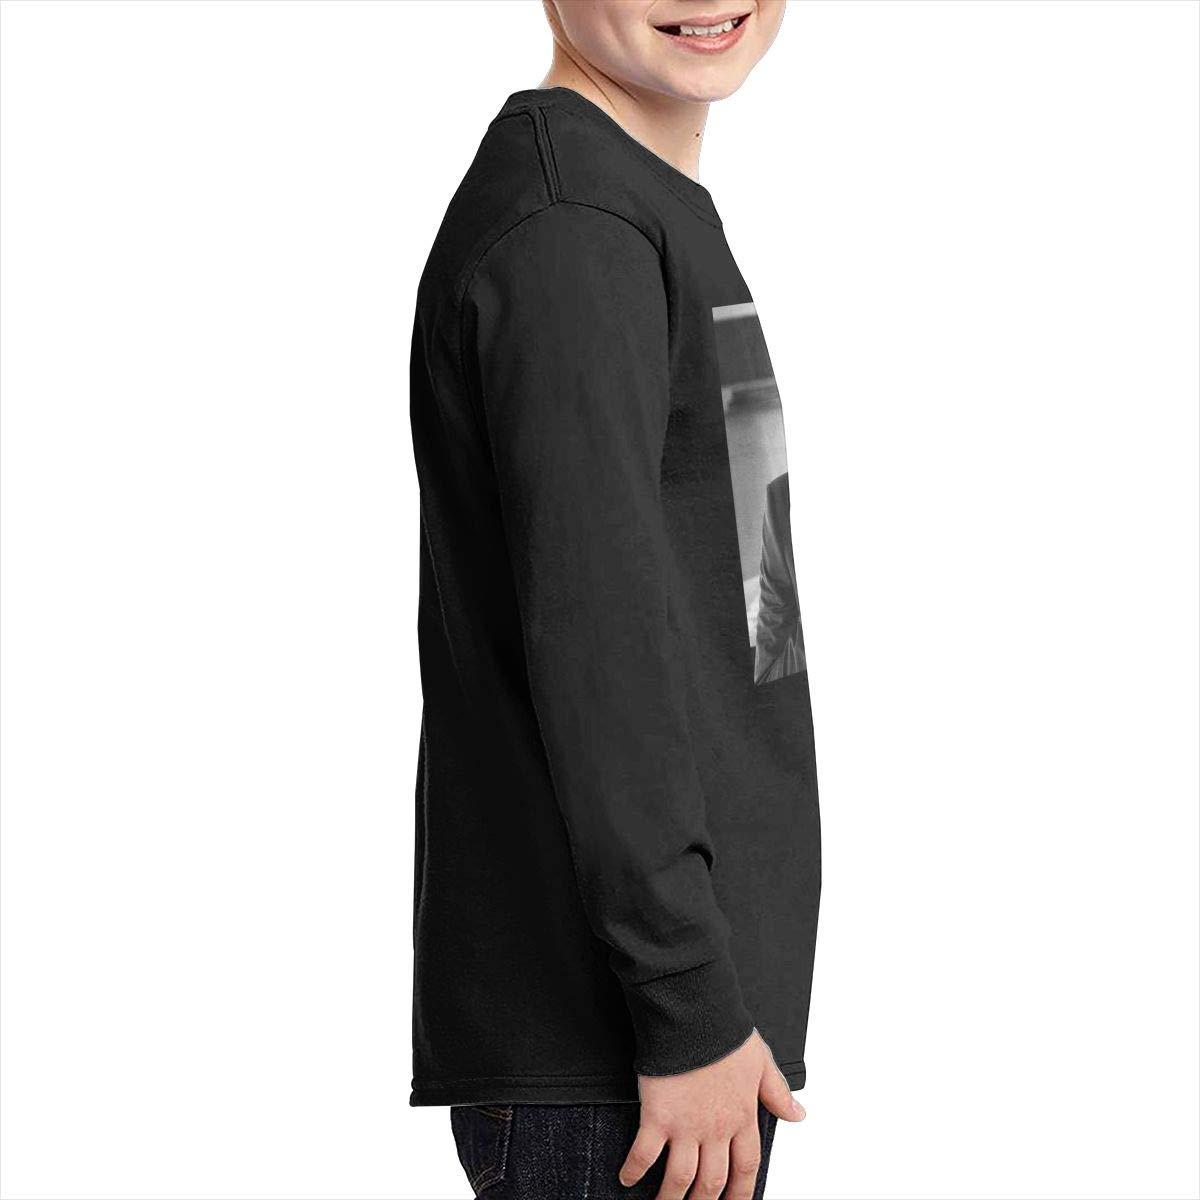 RyanCSchmitt Robert Pattinson Youth Boys Girls Crew Neck Long Sleeves T Shirt Fashion Teenagers Tee Shirts